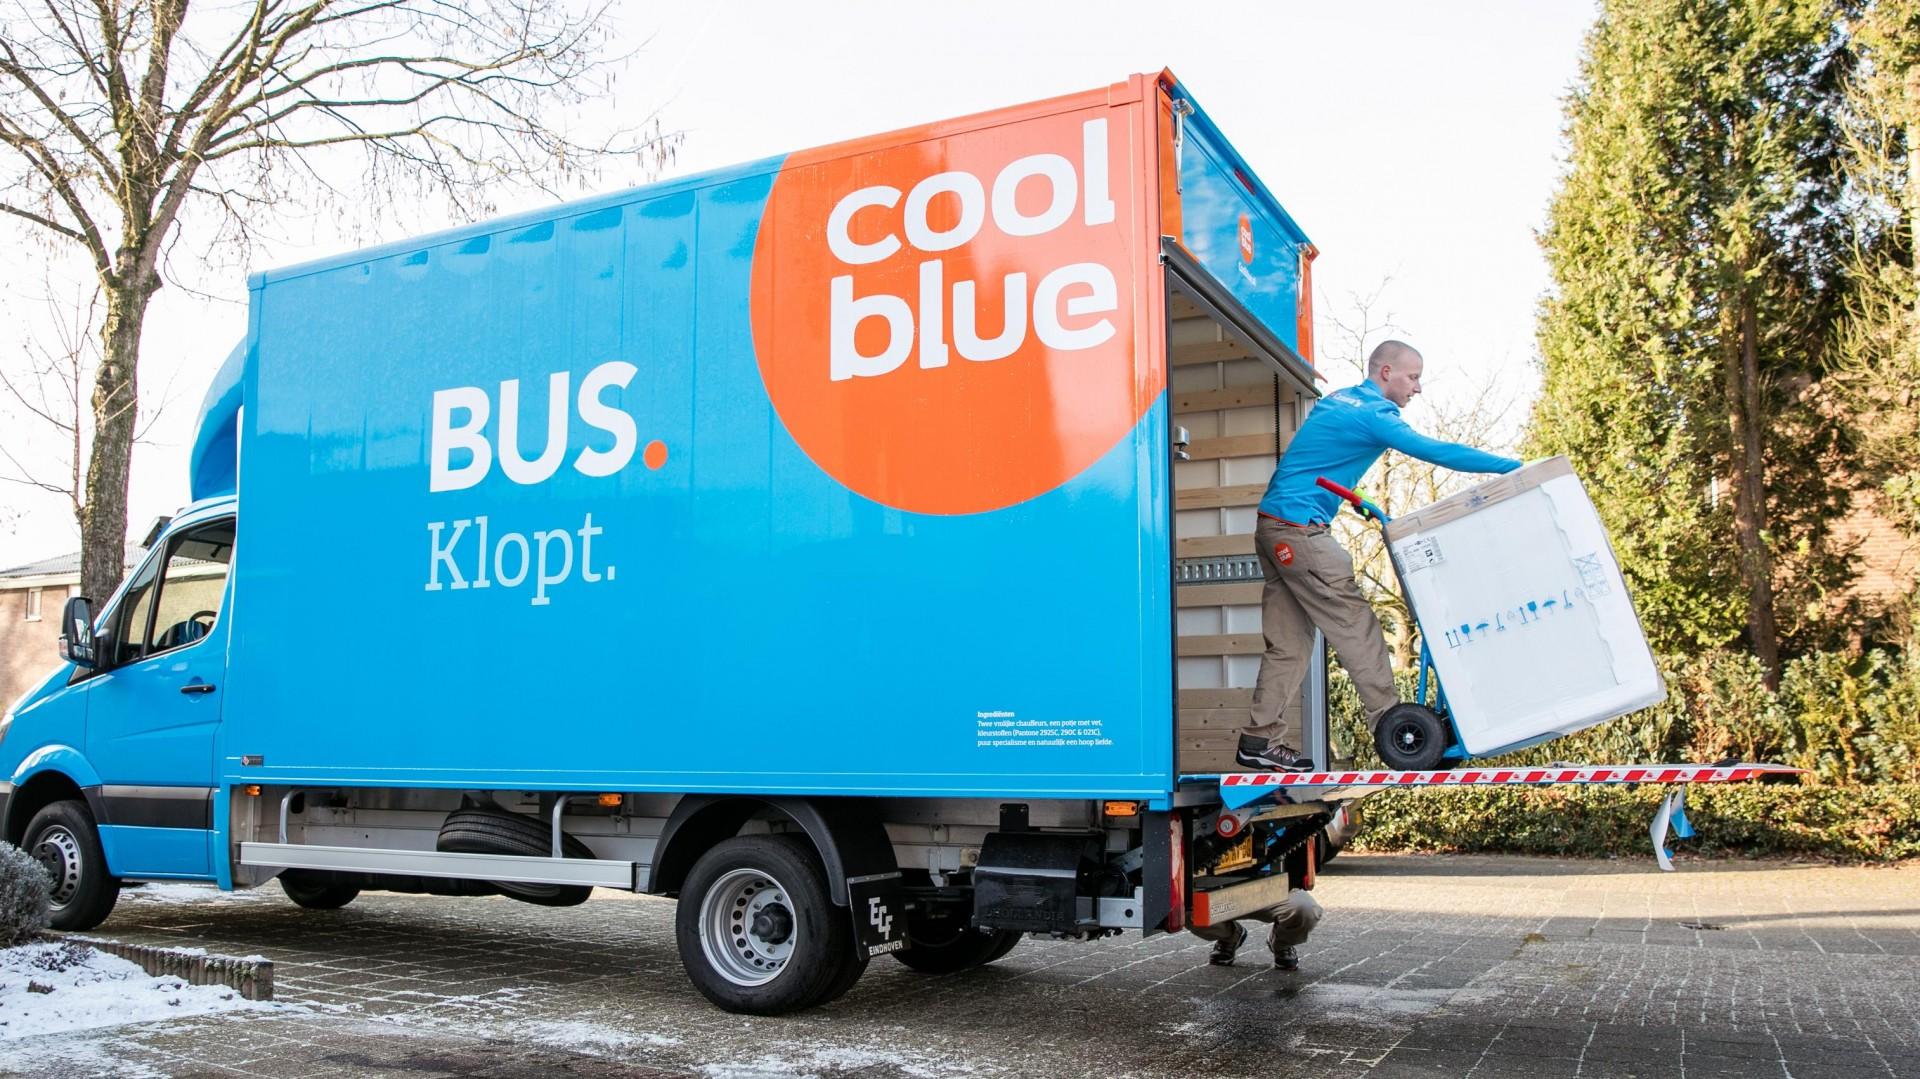 CoolblueBezorgt: Coolblue start met uitrol witgoedbezorging